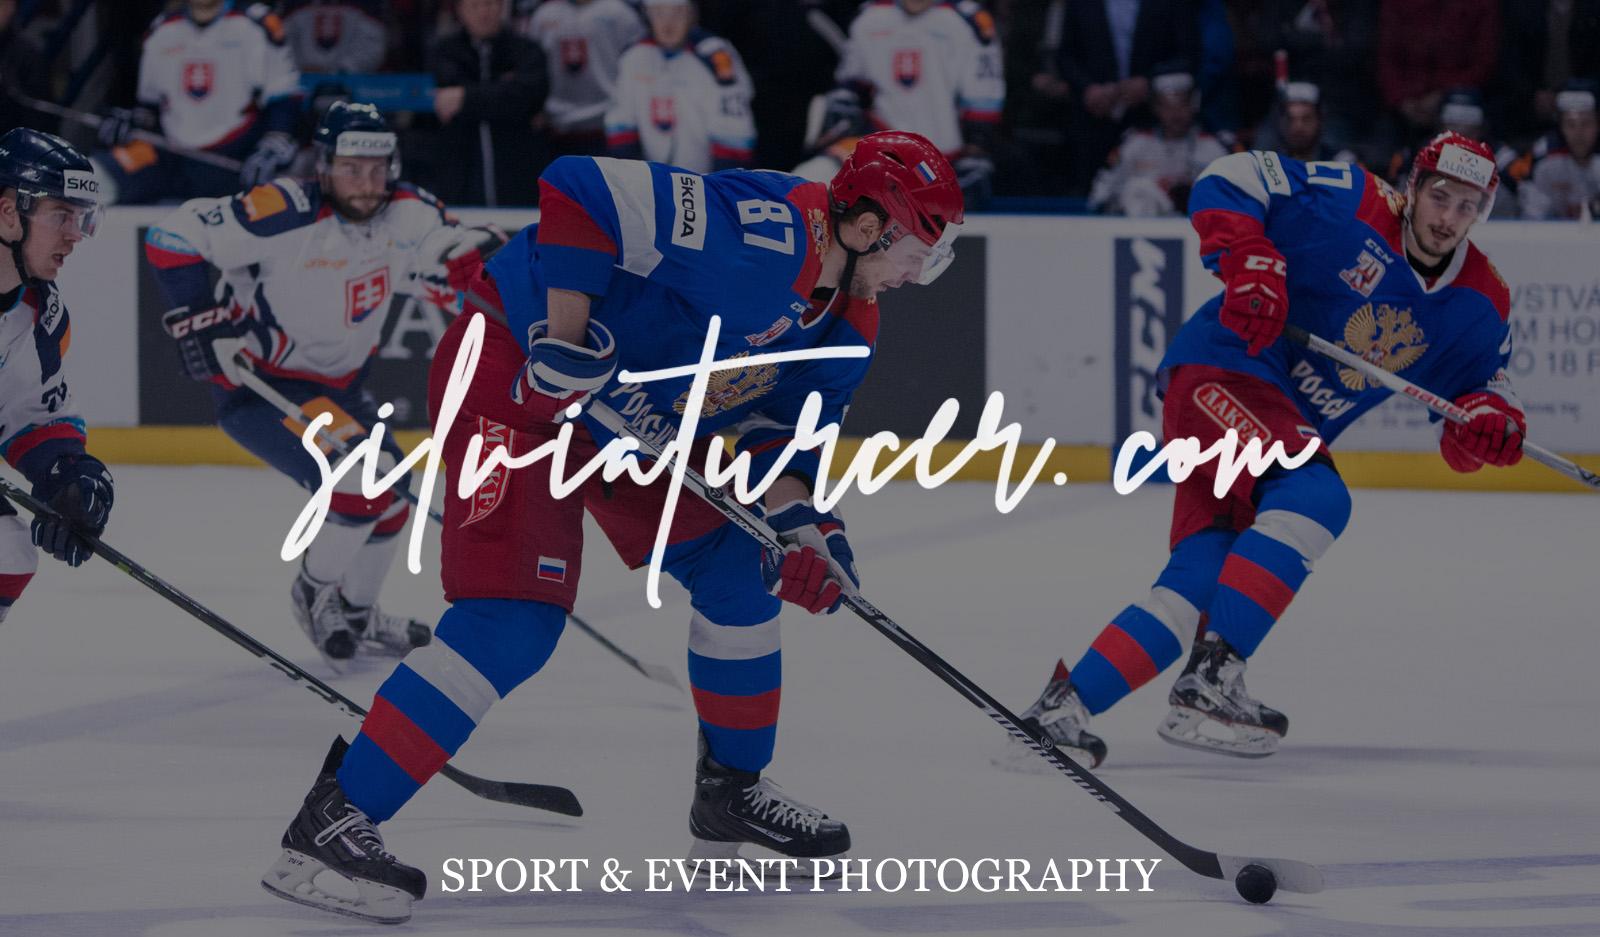 Hokej intro